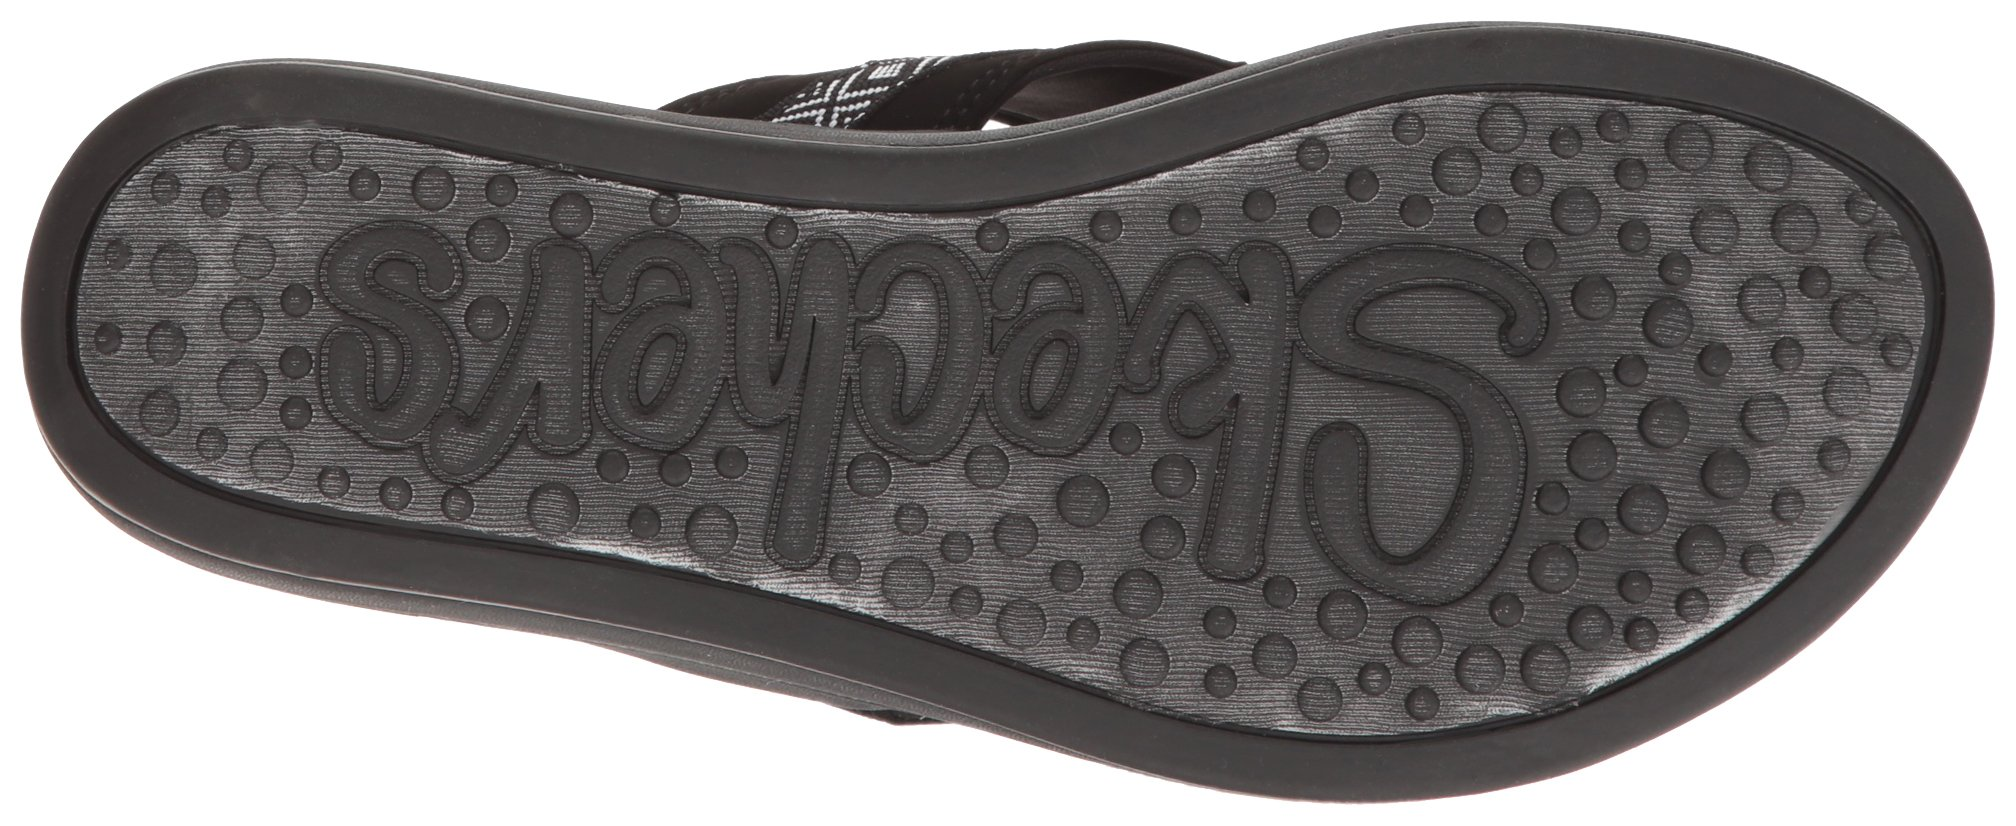 Skechers Modern Comfort Sandals Women's Upgrades Marina Bay Flip Flop Black/White, 8 M US by Skechers (Image #3)